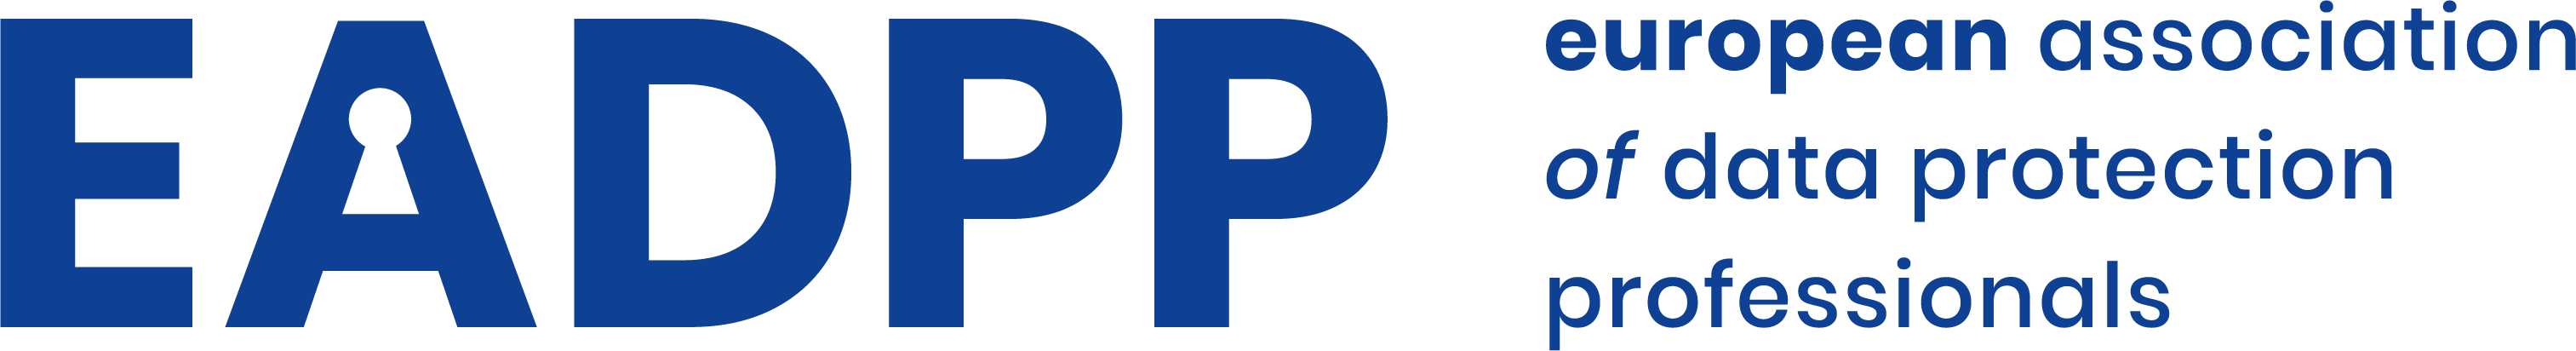 LOGO-EADPP-BLUE-ALT